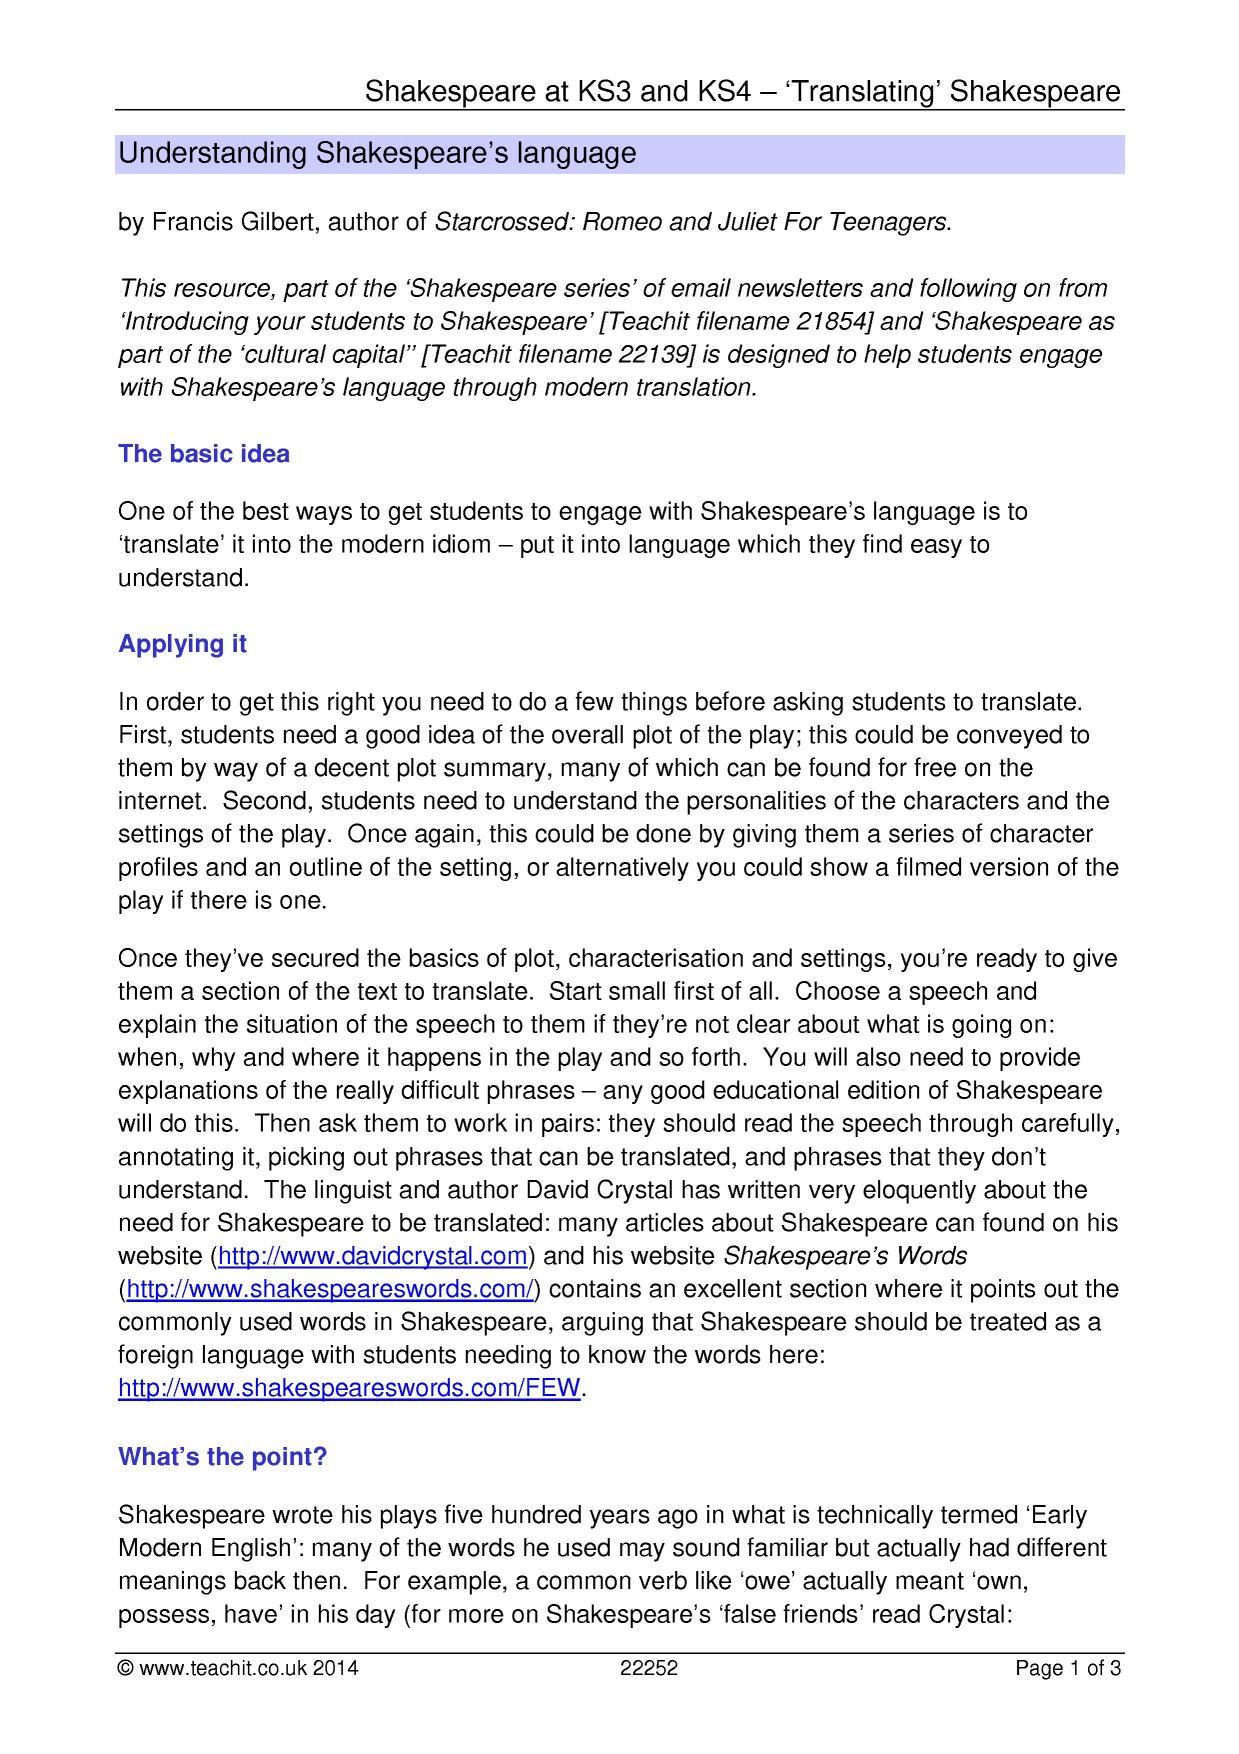 KS3 Introduction to Shakespeare language – Shakespeare Language Worksheet